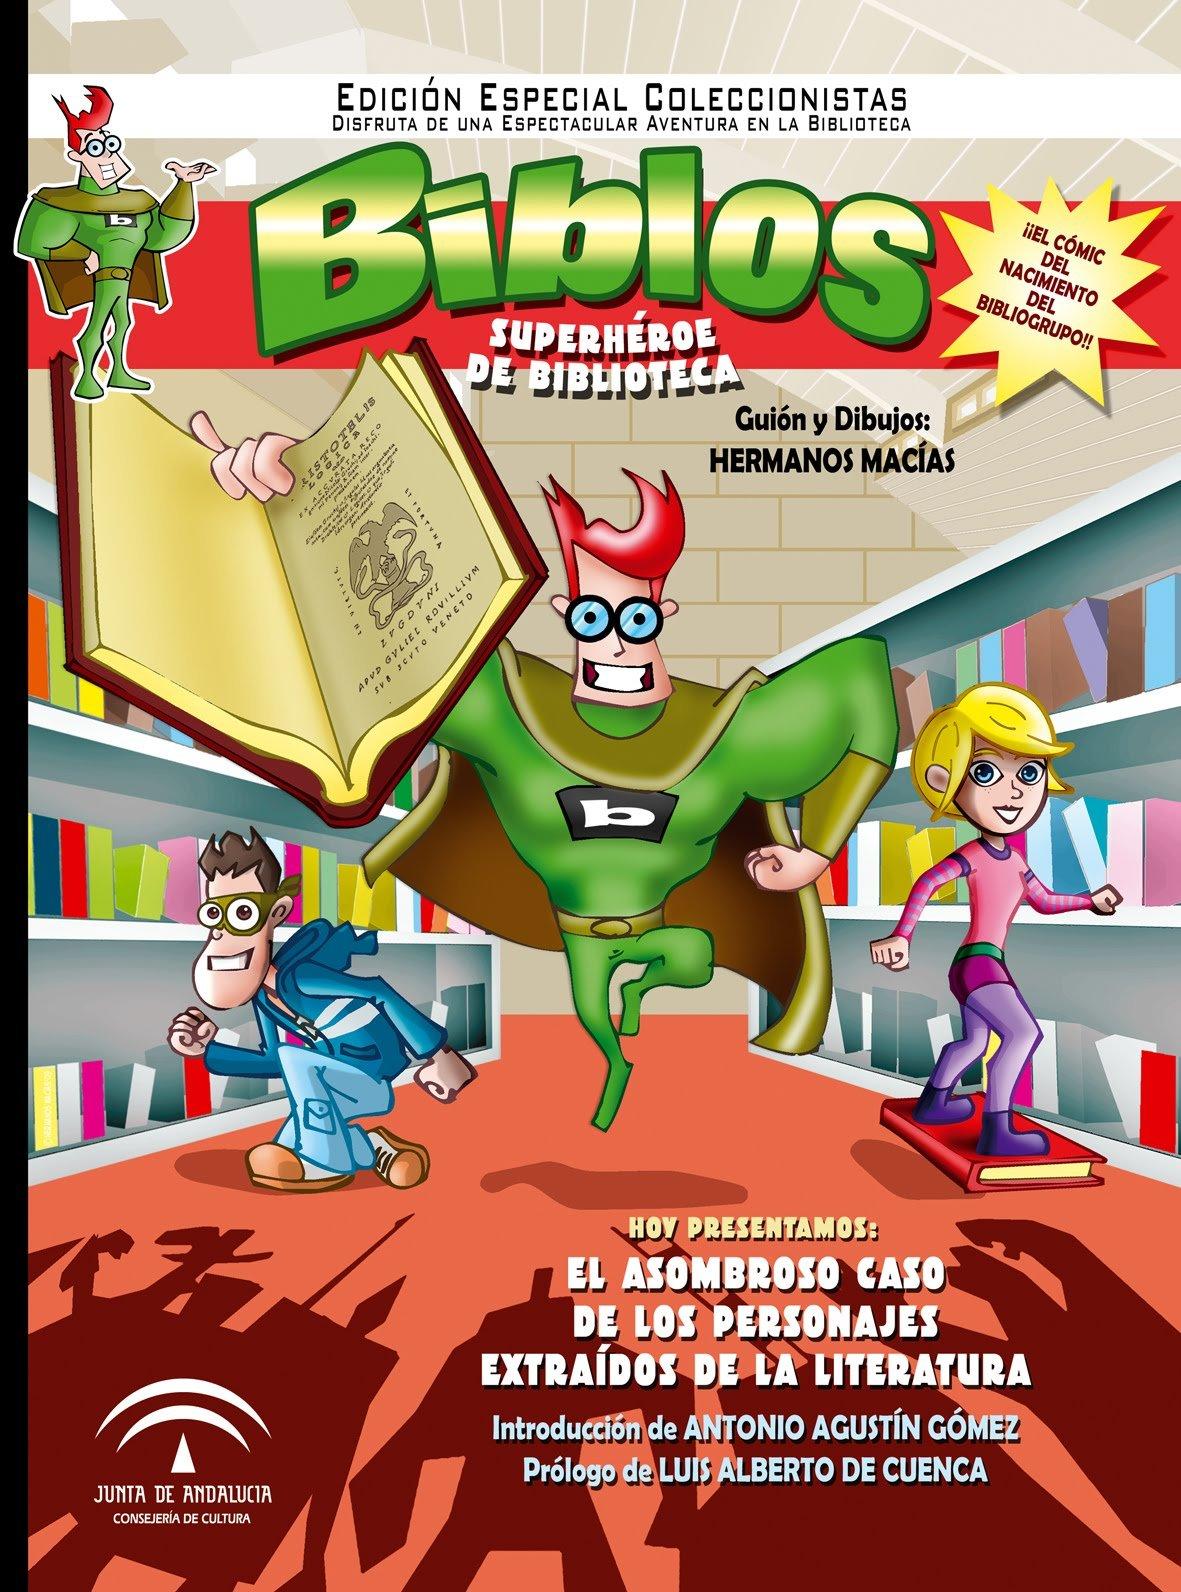 Biblos, superhéroe de biblioteca